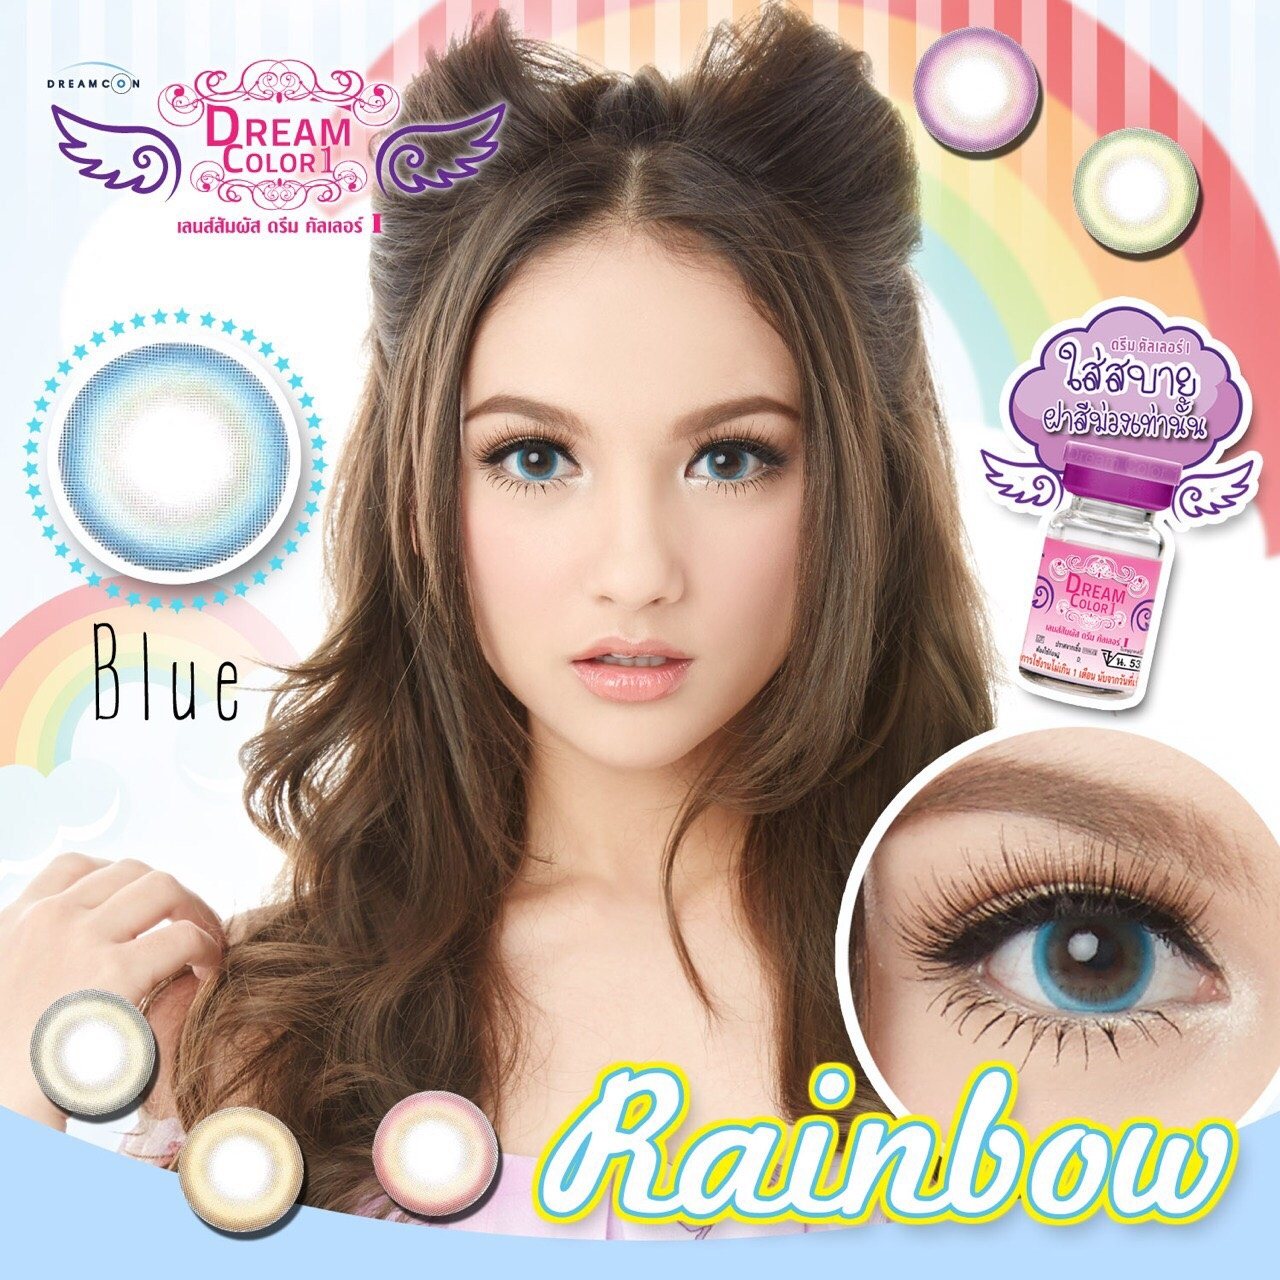 Rainbow Blue Dreamcolor1เลนส์นิ่มใส่สบาย คอนแทคเลนส์ ขายส่งคอนแทคเลนส์ ขายส่งBigeye Bigeyeเกาหลี